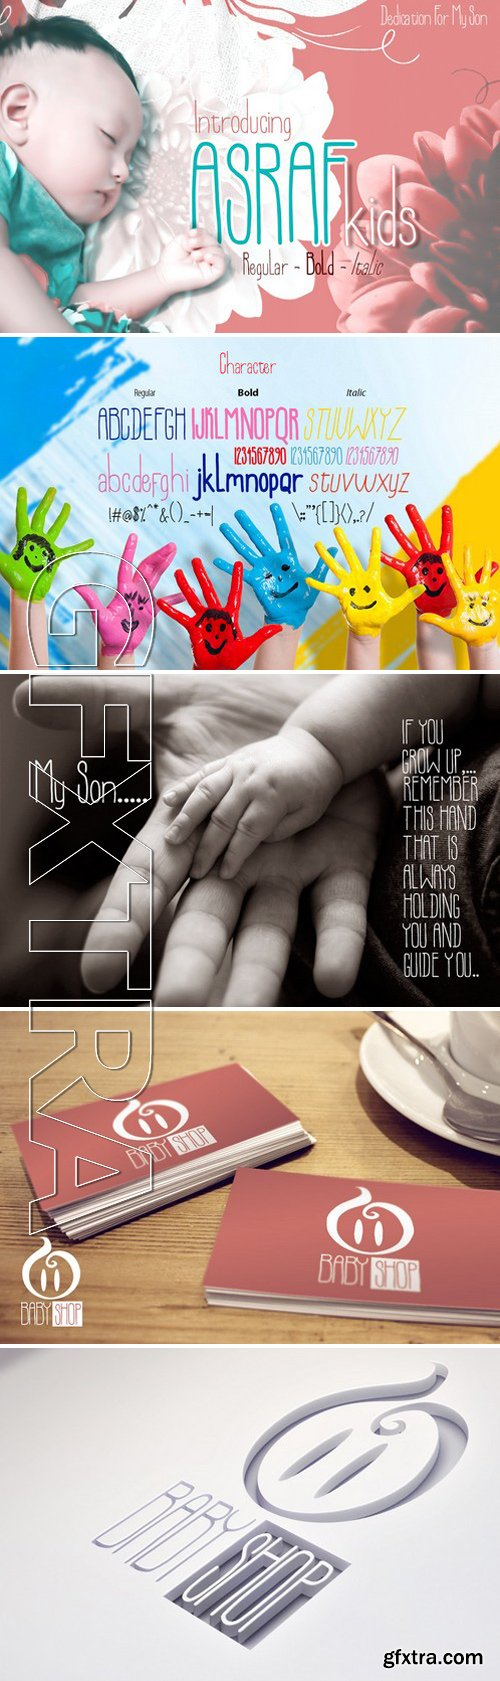 CM - Asraf Kids Family 250364